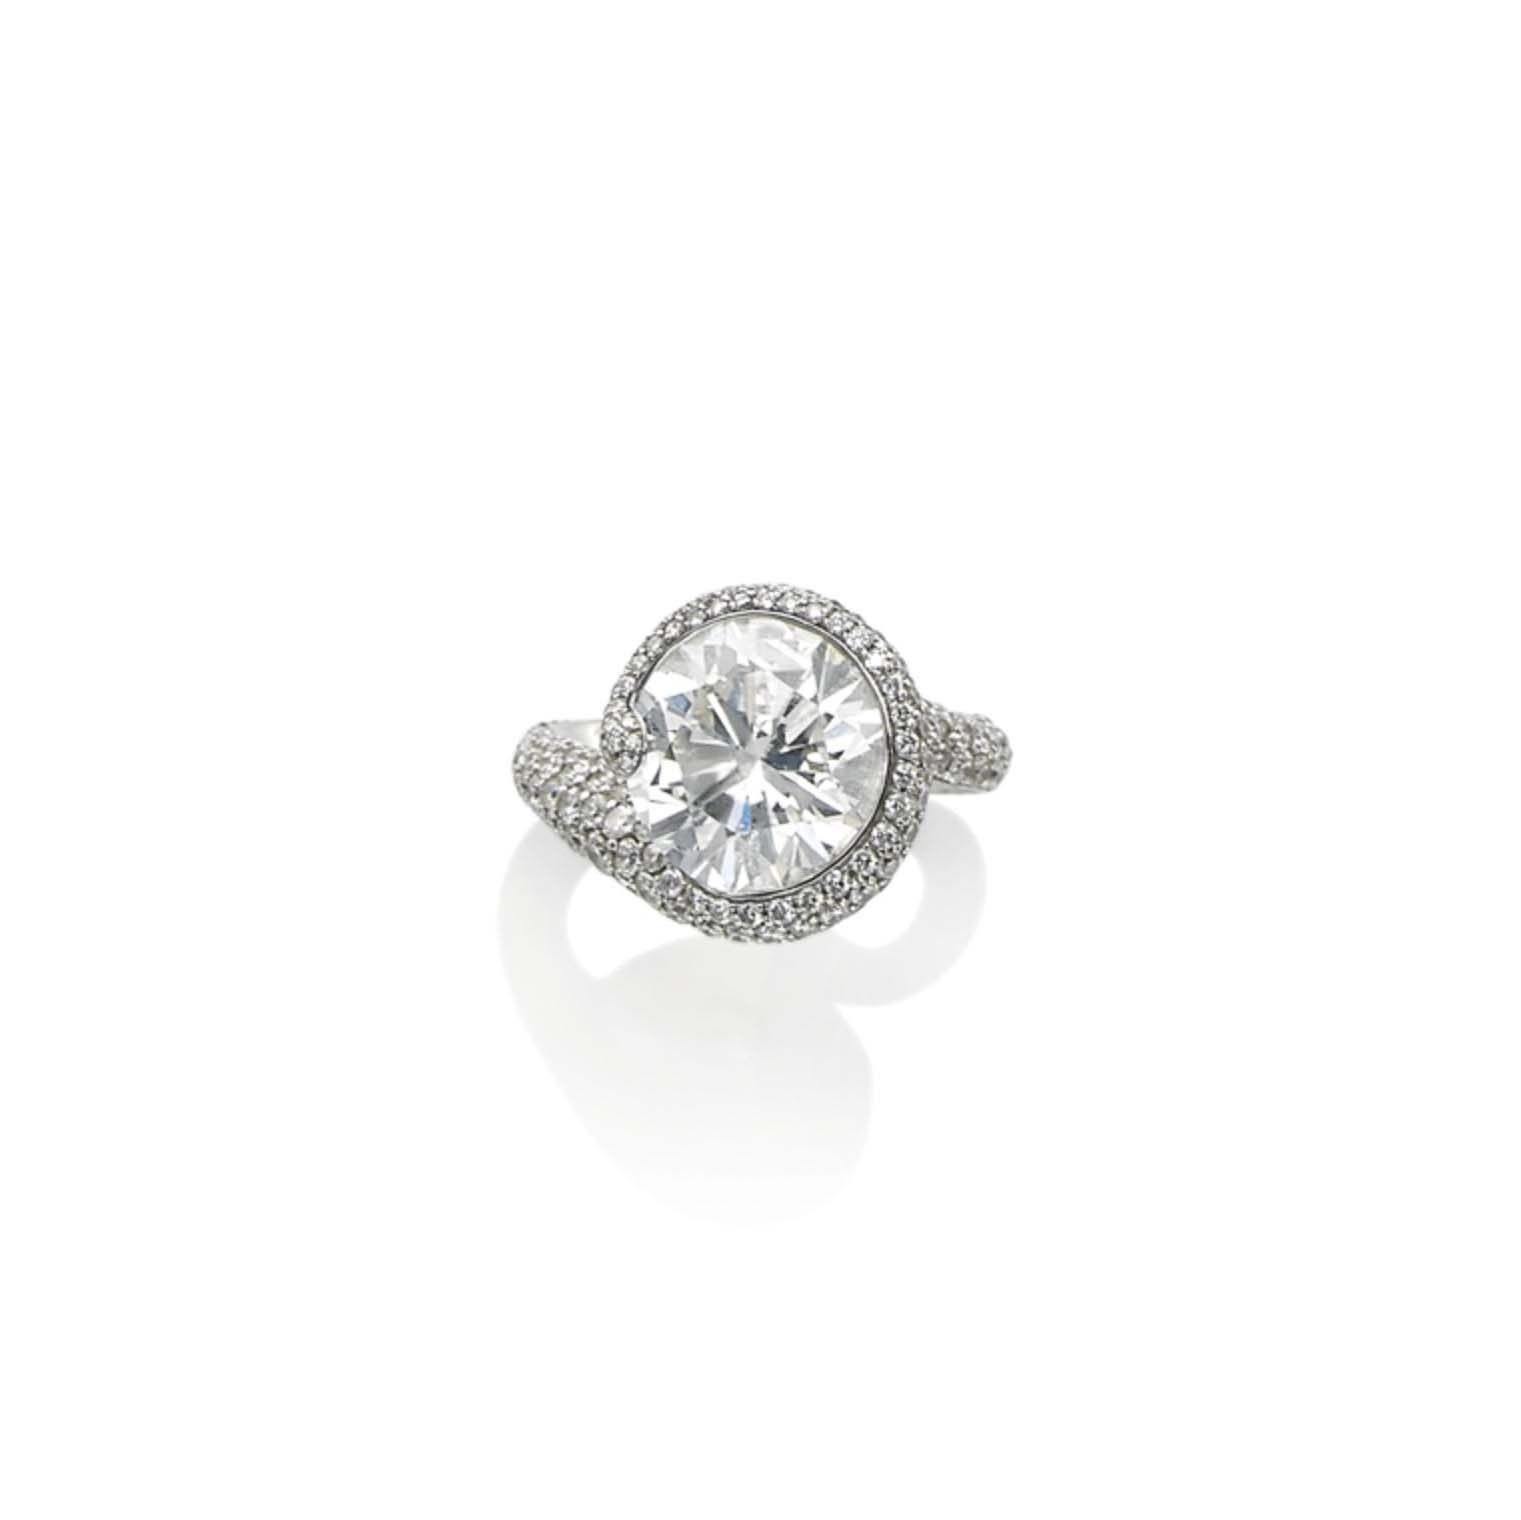 A DIAMOND RING, BY DE GRISOGONO